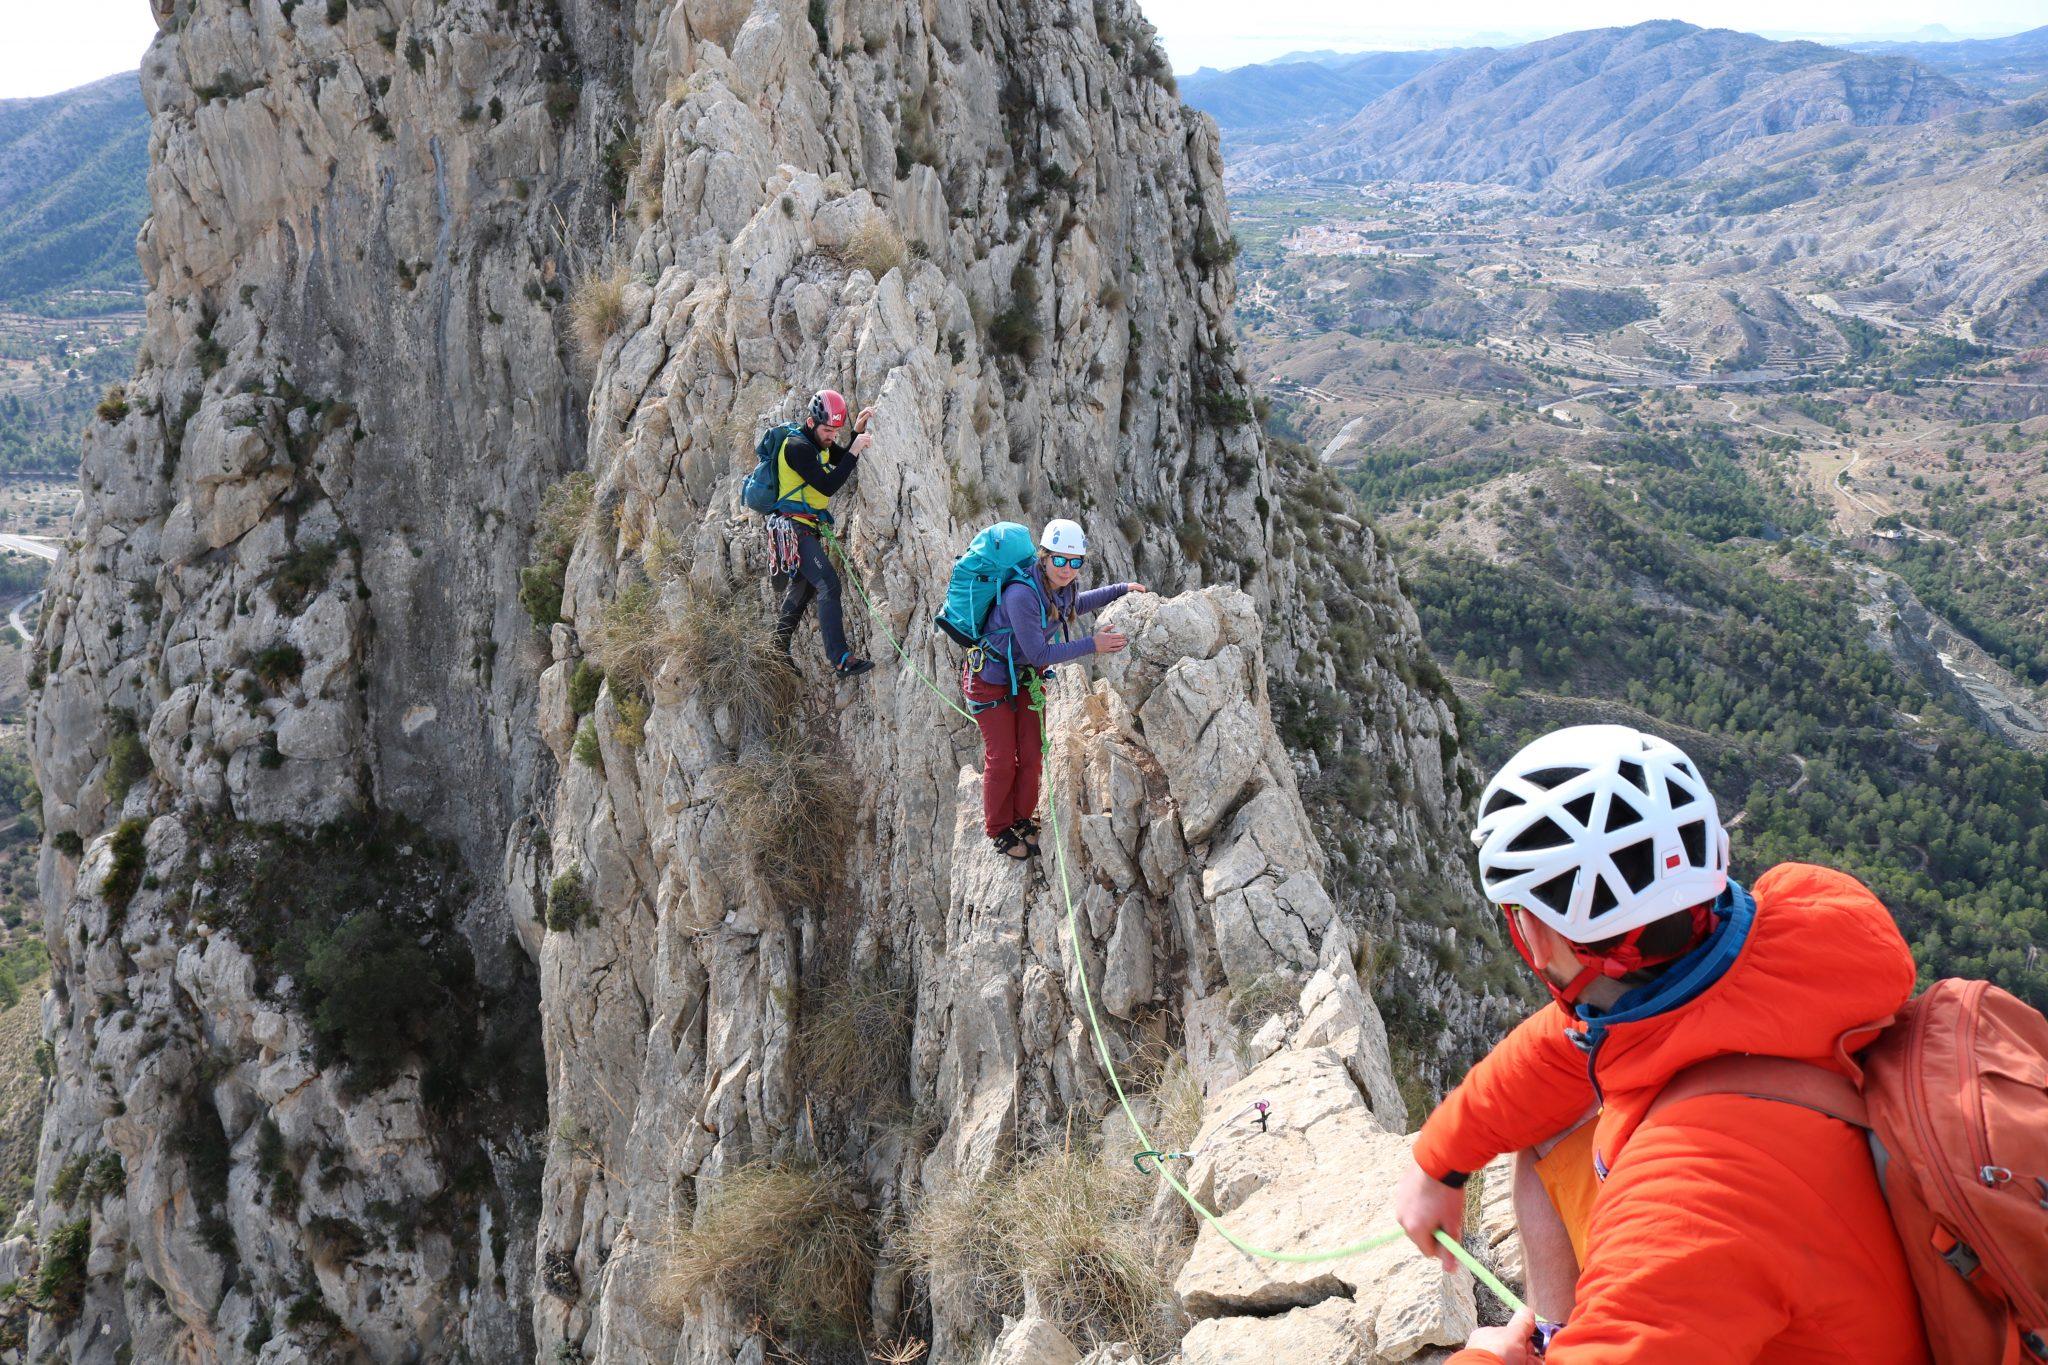 Outdoor instructor training climbing